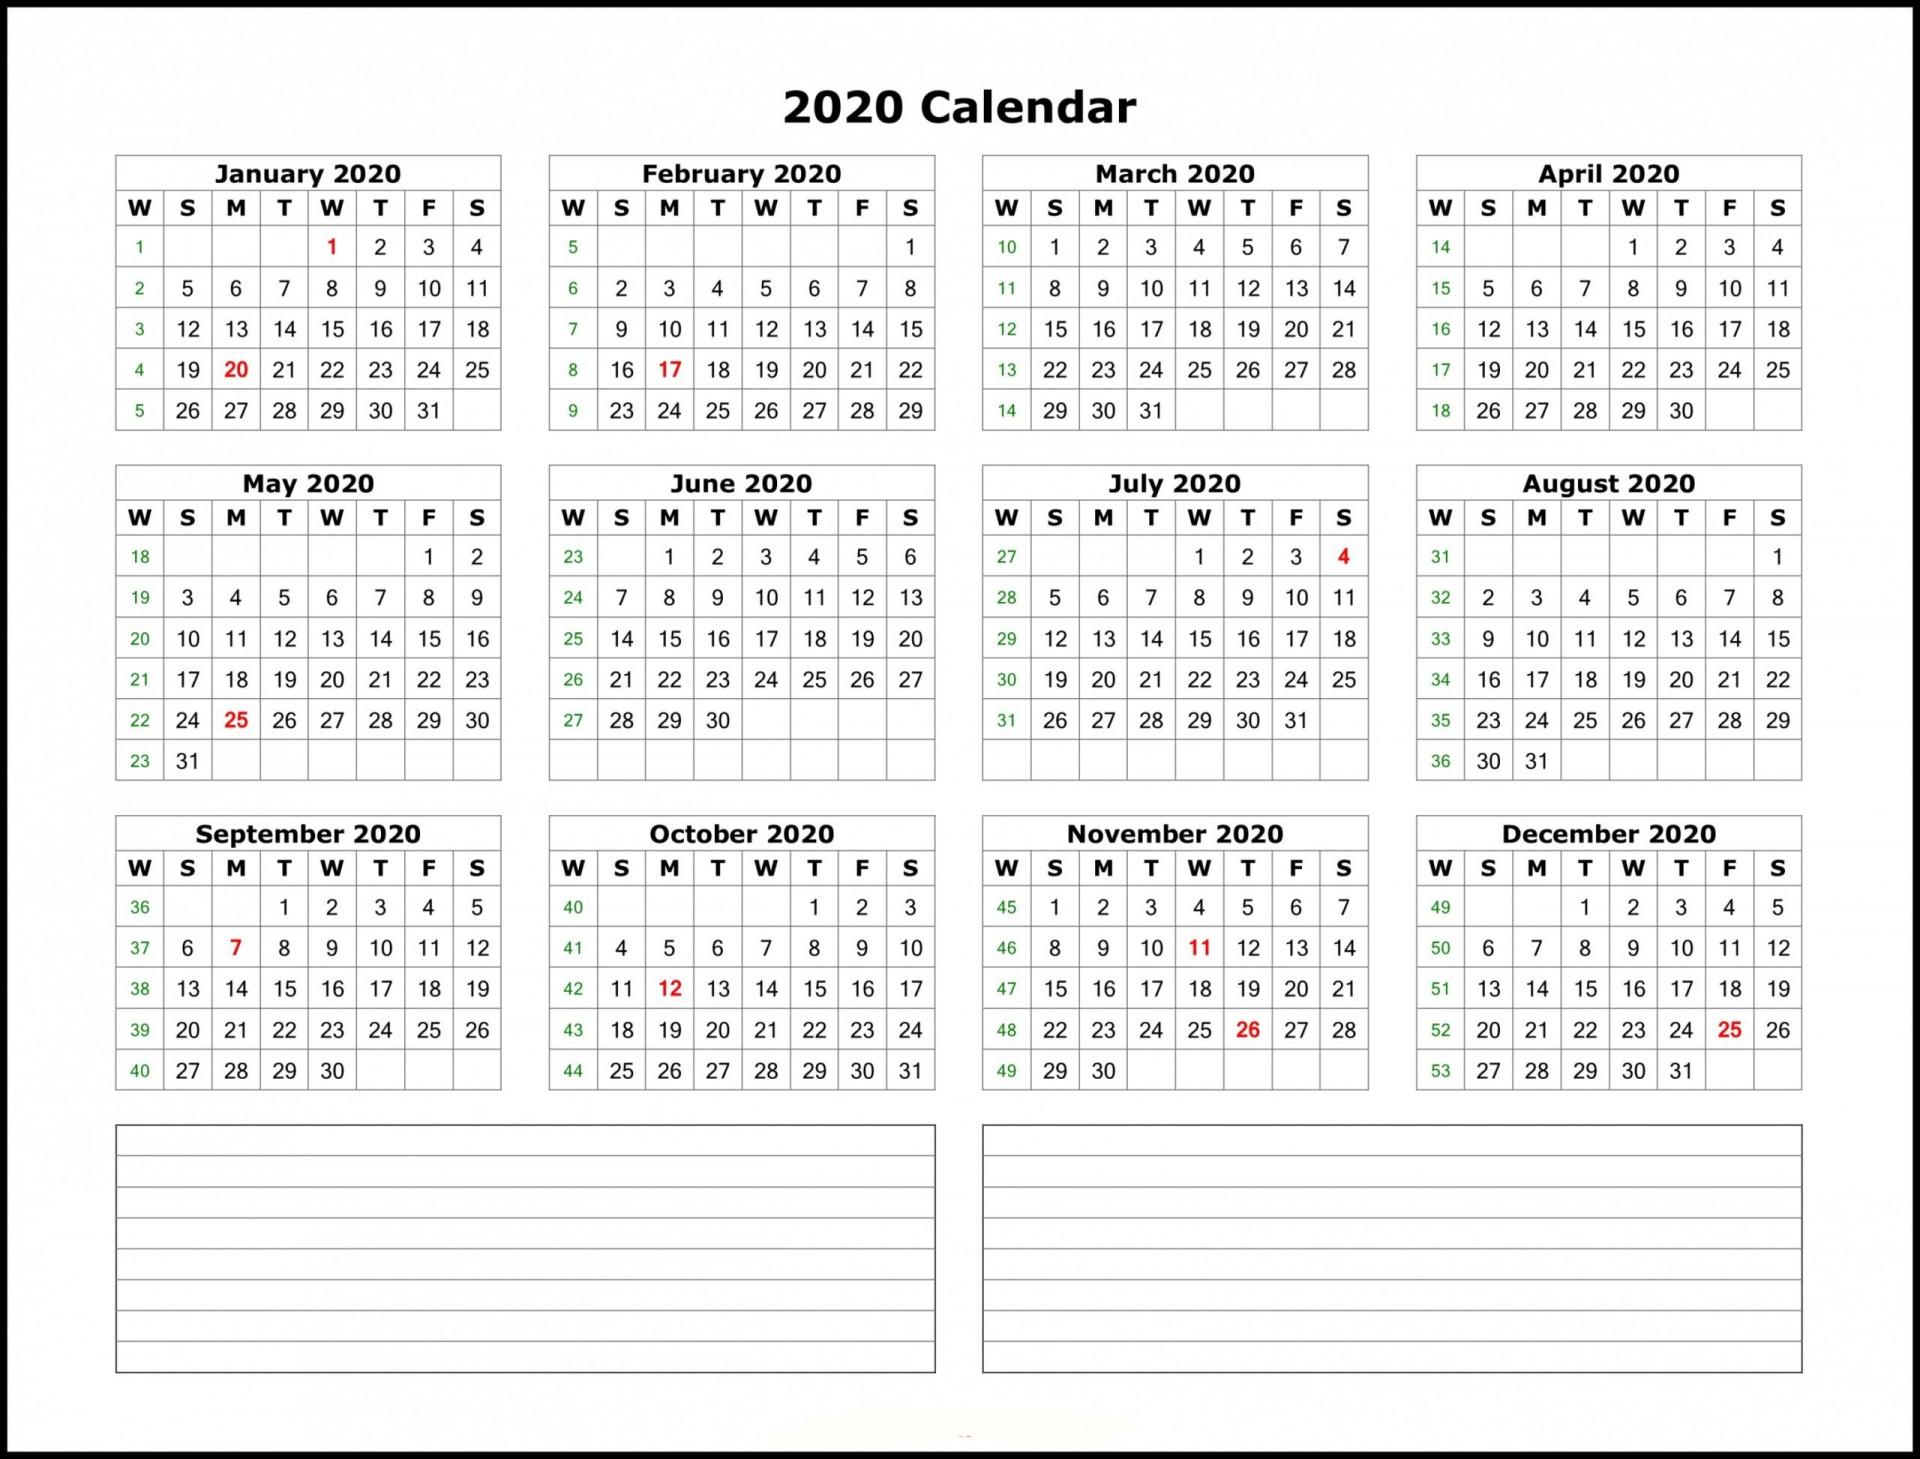 006 Phenomenal 2020 Payroll Calendar Template Highest Quality  Biweekly Canada Free Excel1920